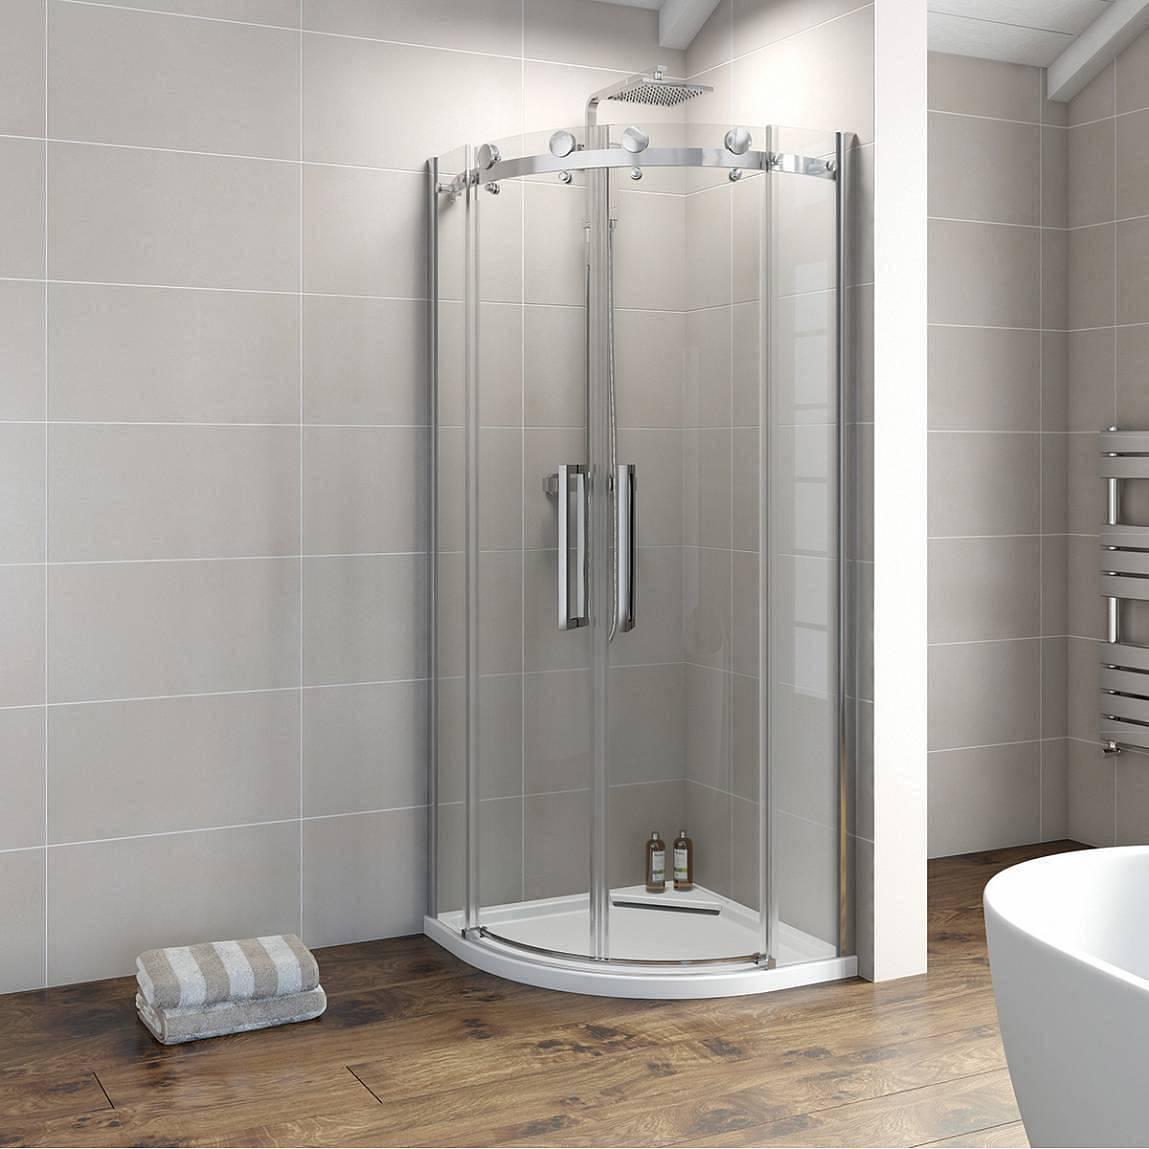 Image of V8+ 8mm Frameless Quadrant Shower Enclosure 800